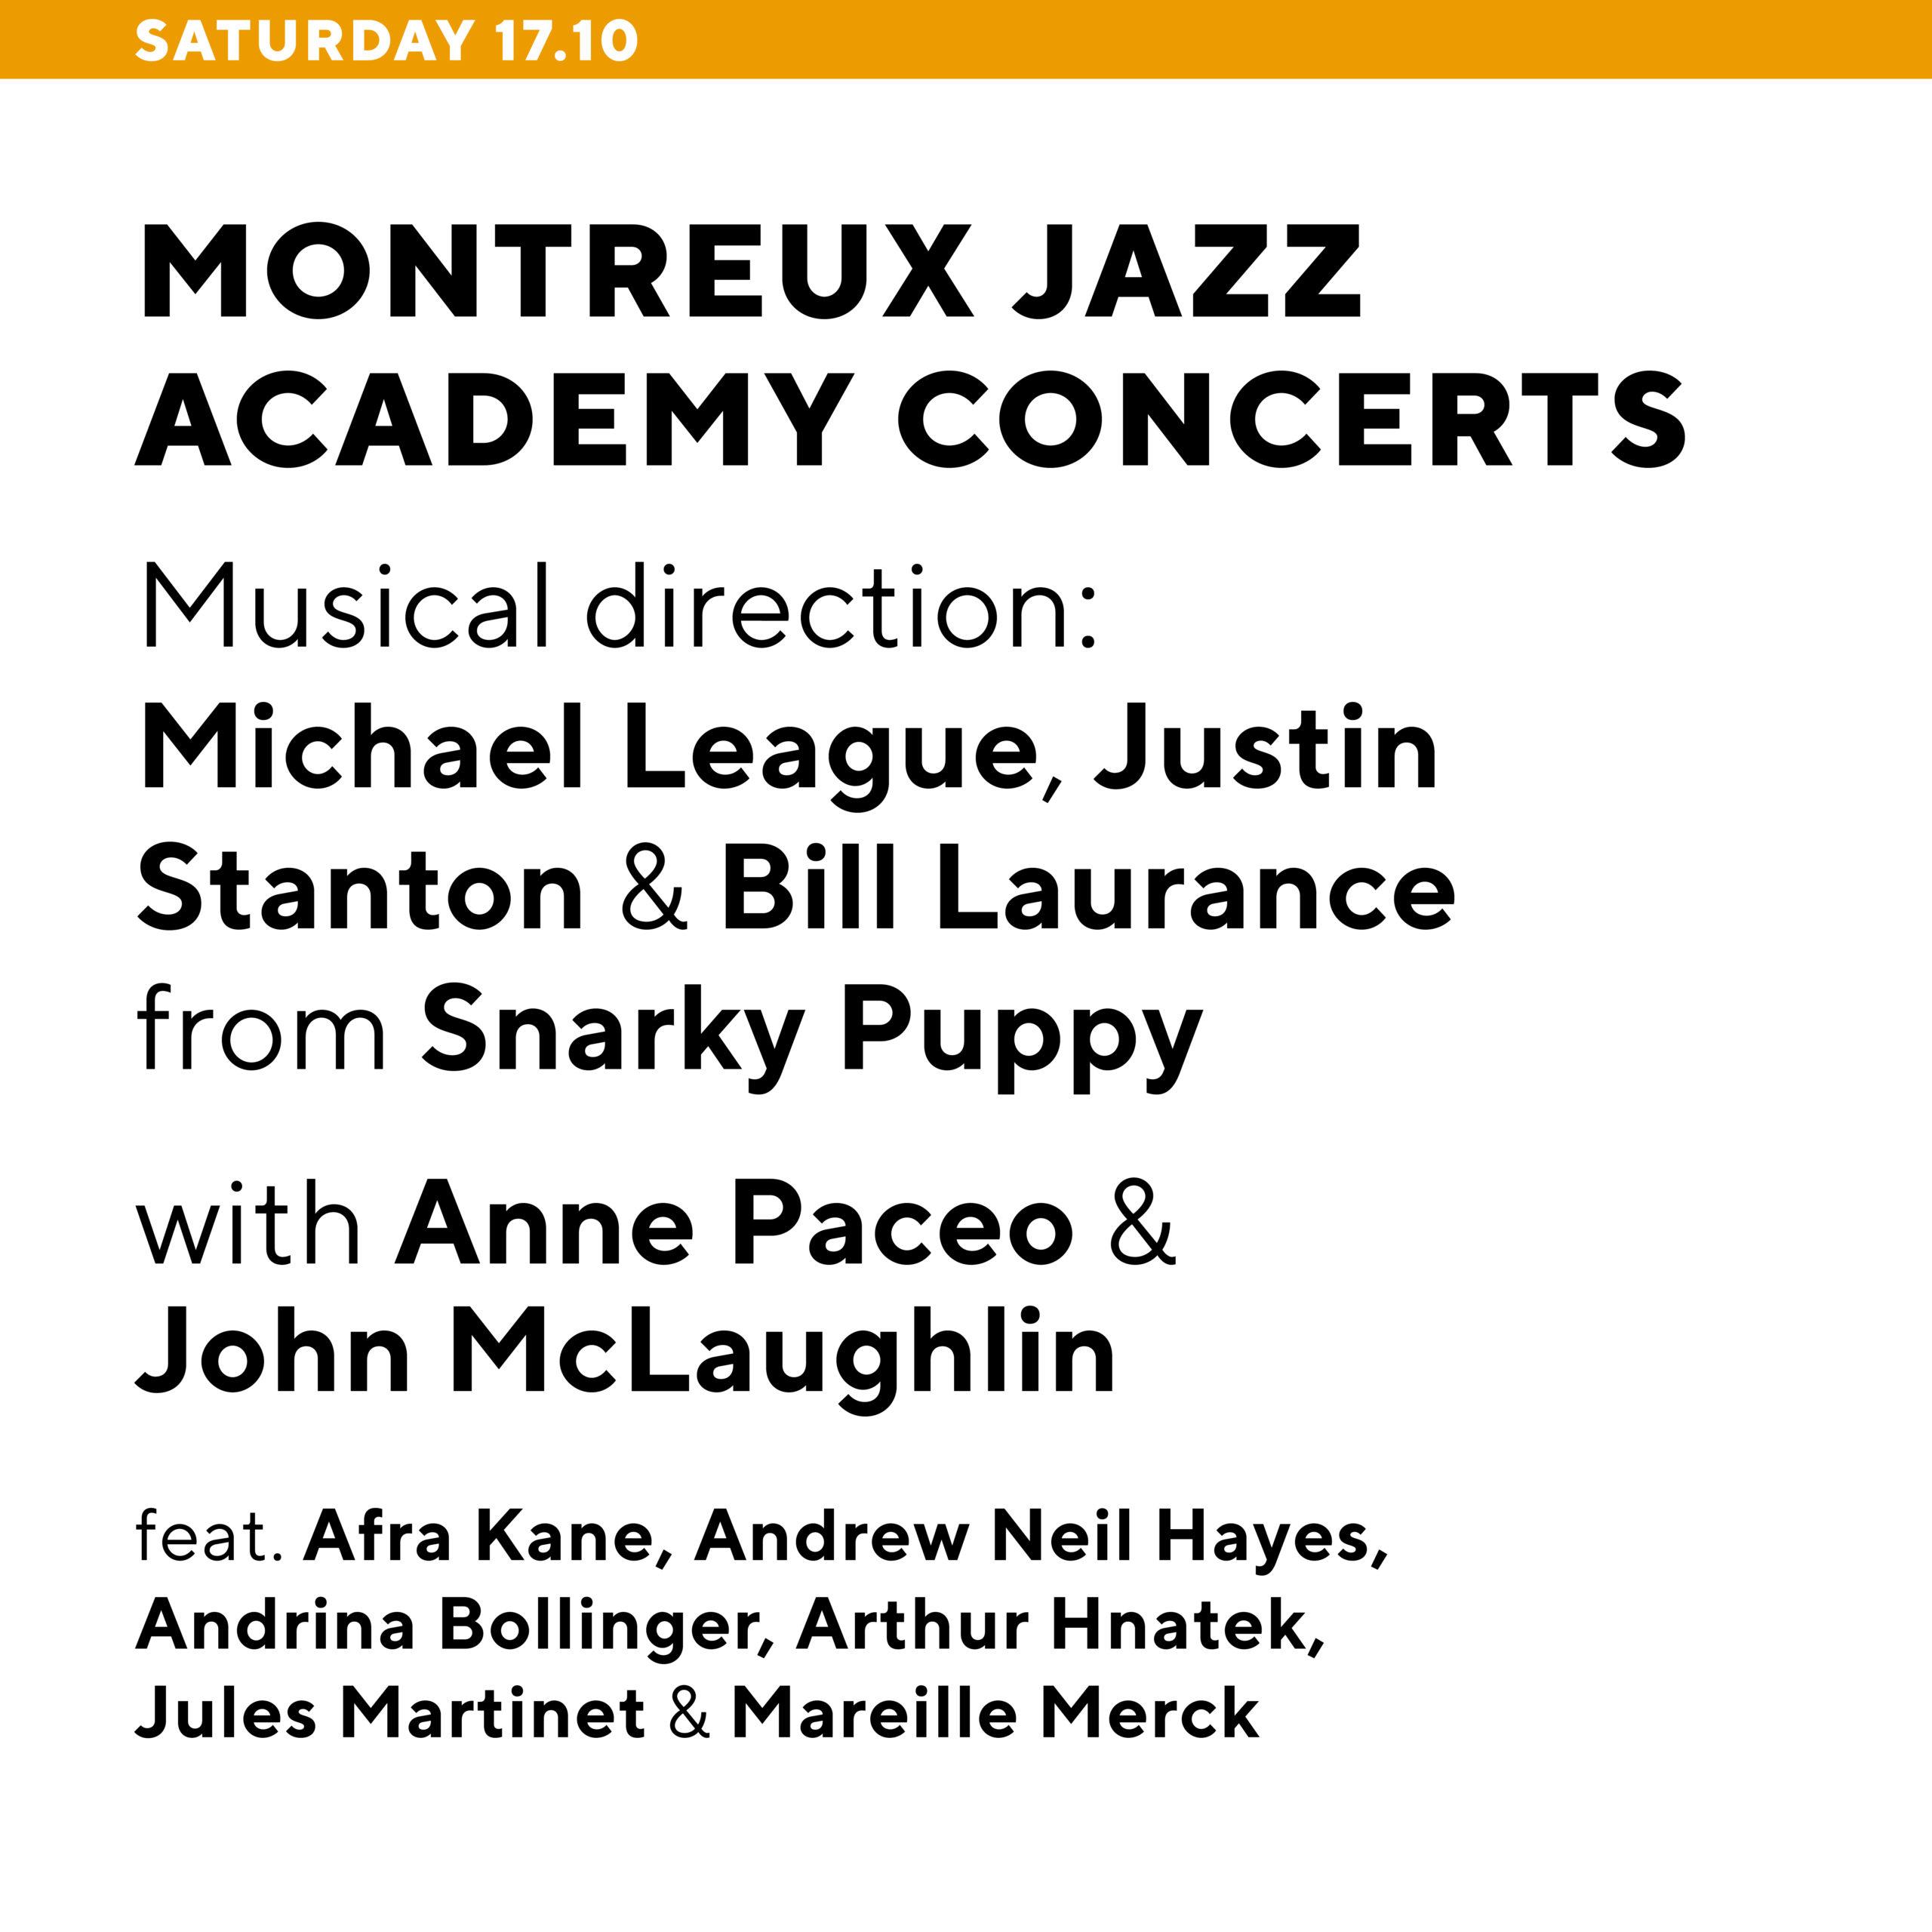 Montreux Jazz Academy concerts